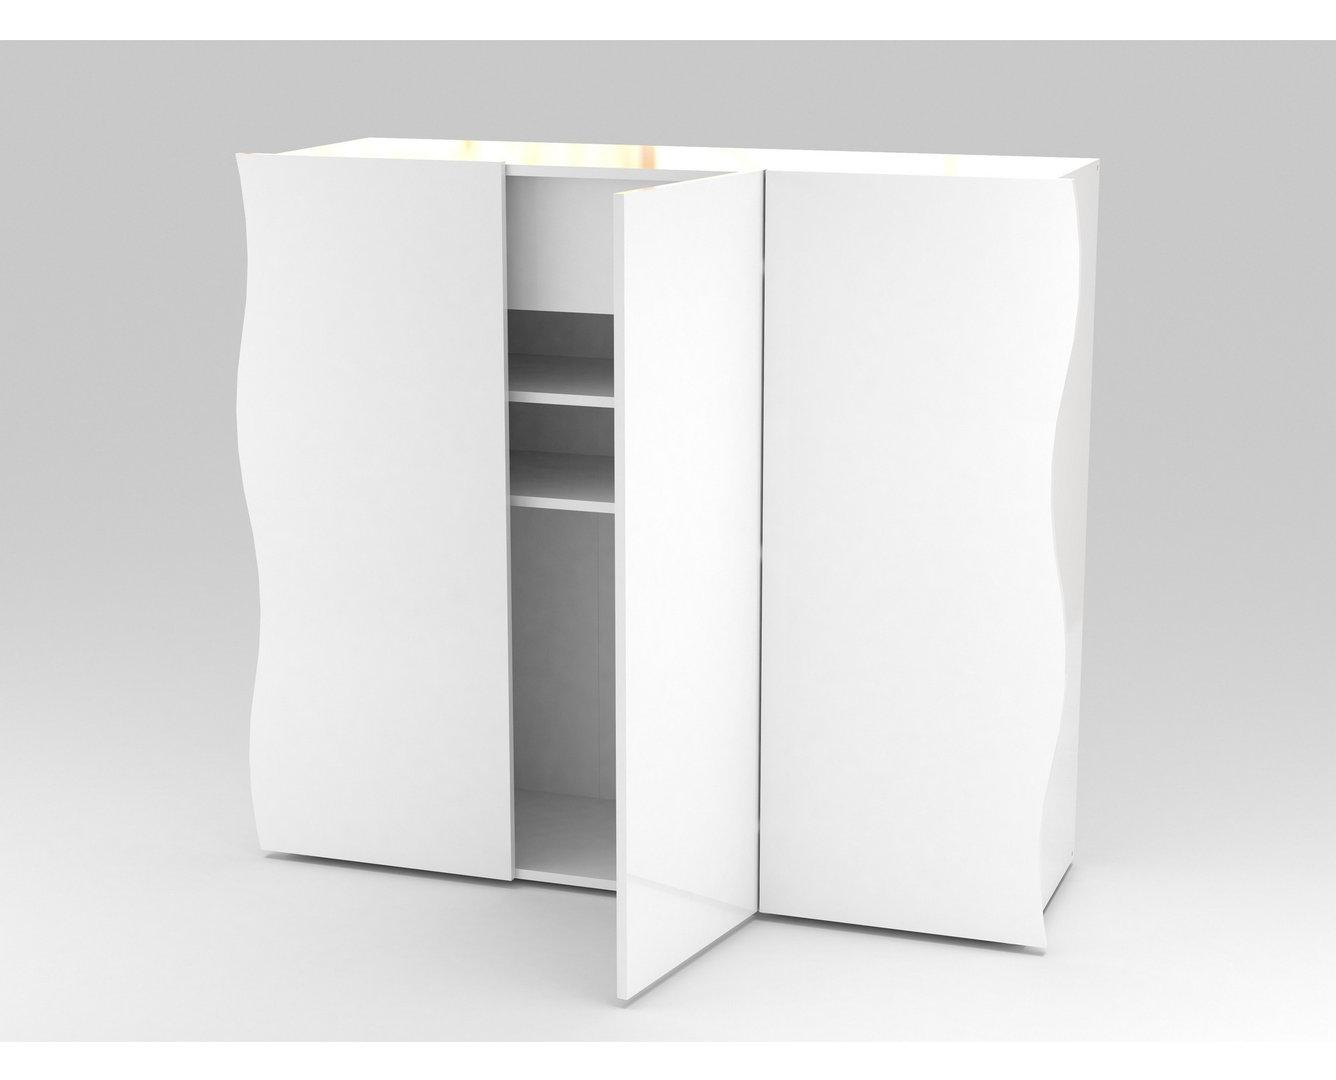 Entrata moderna goccia xl mobili per ingresso - Mobili di entrata ...